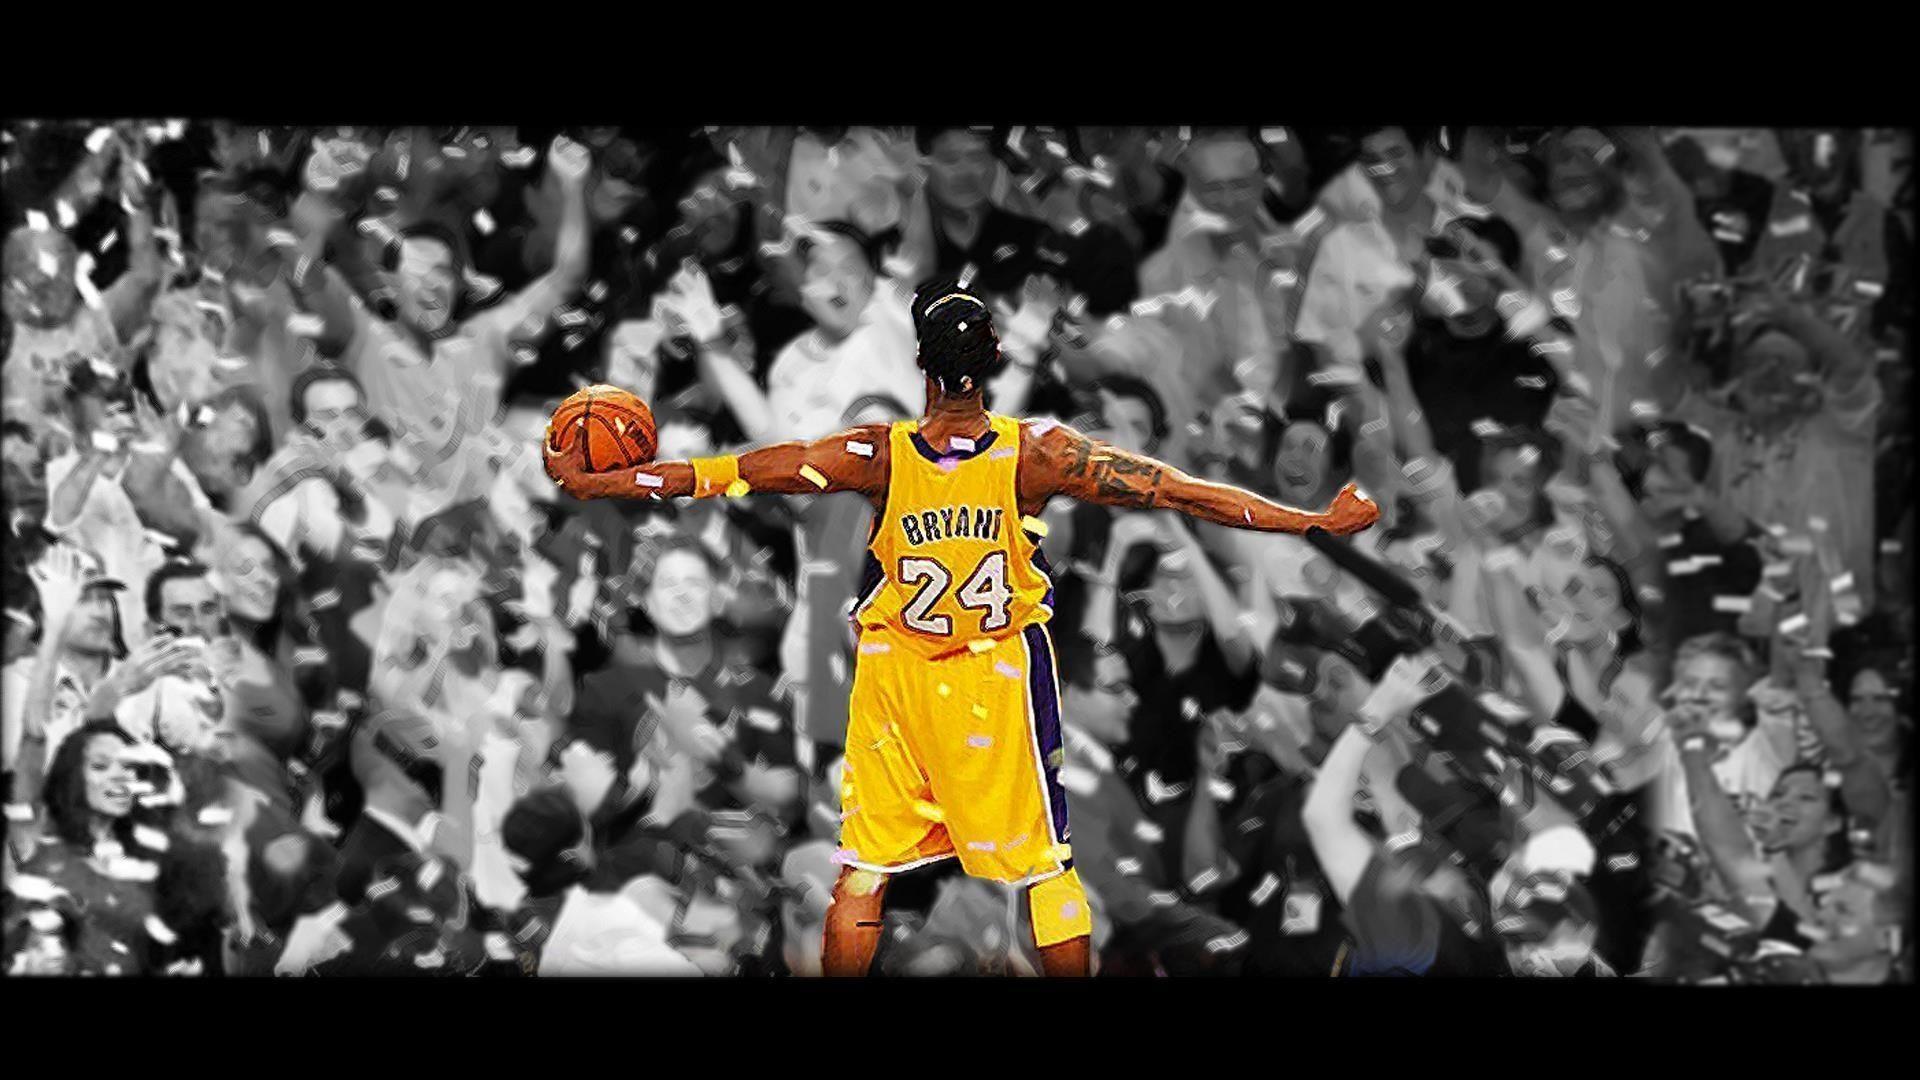 10 Top Kobe Bryant Wallpaper 1920x1080 Full Hd 1920 1080 For Pc Background 2019 Kobe Bryant Wallpaper Kobe Bryant Iphone Wallpaper Kobe Bryant